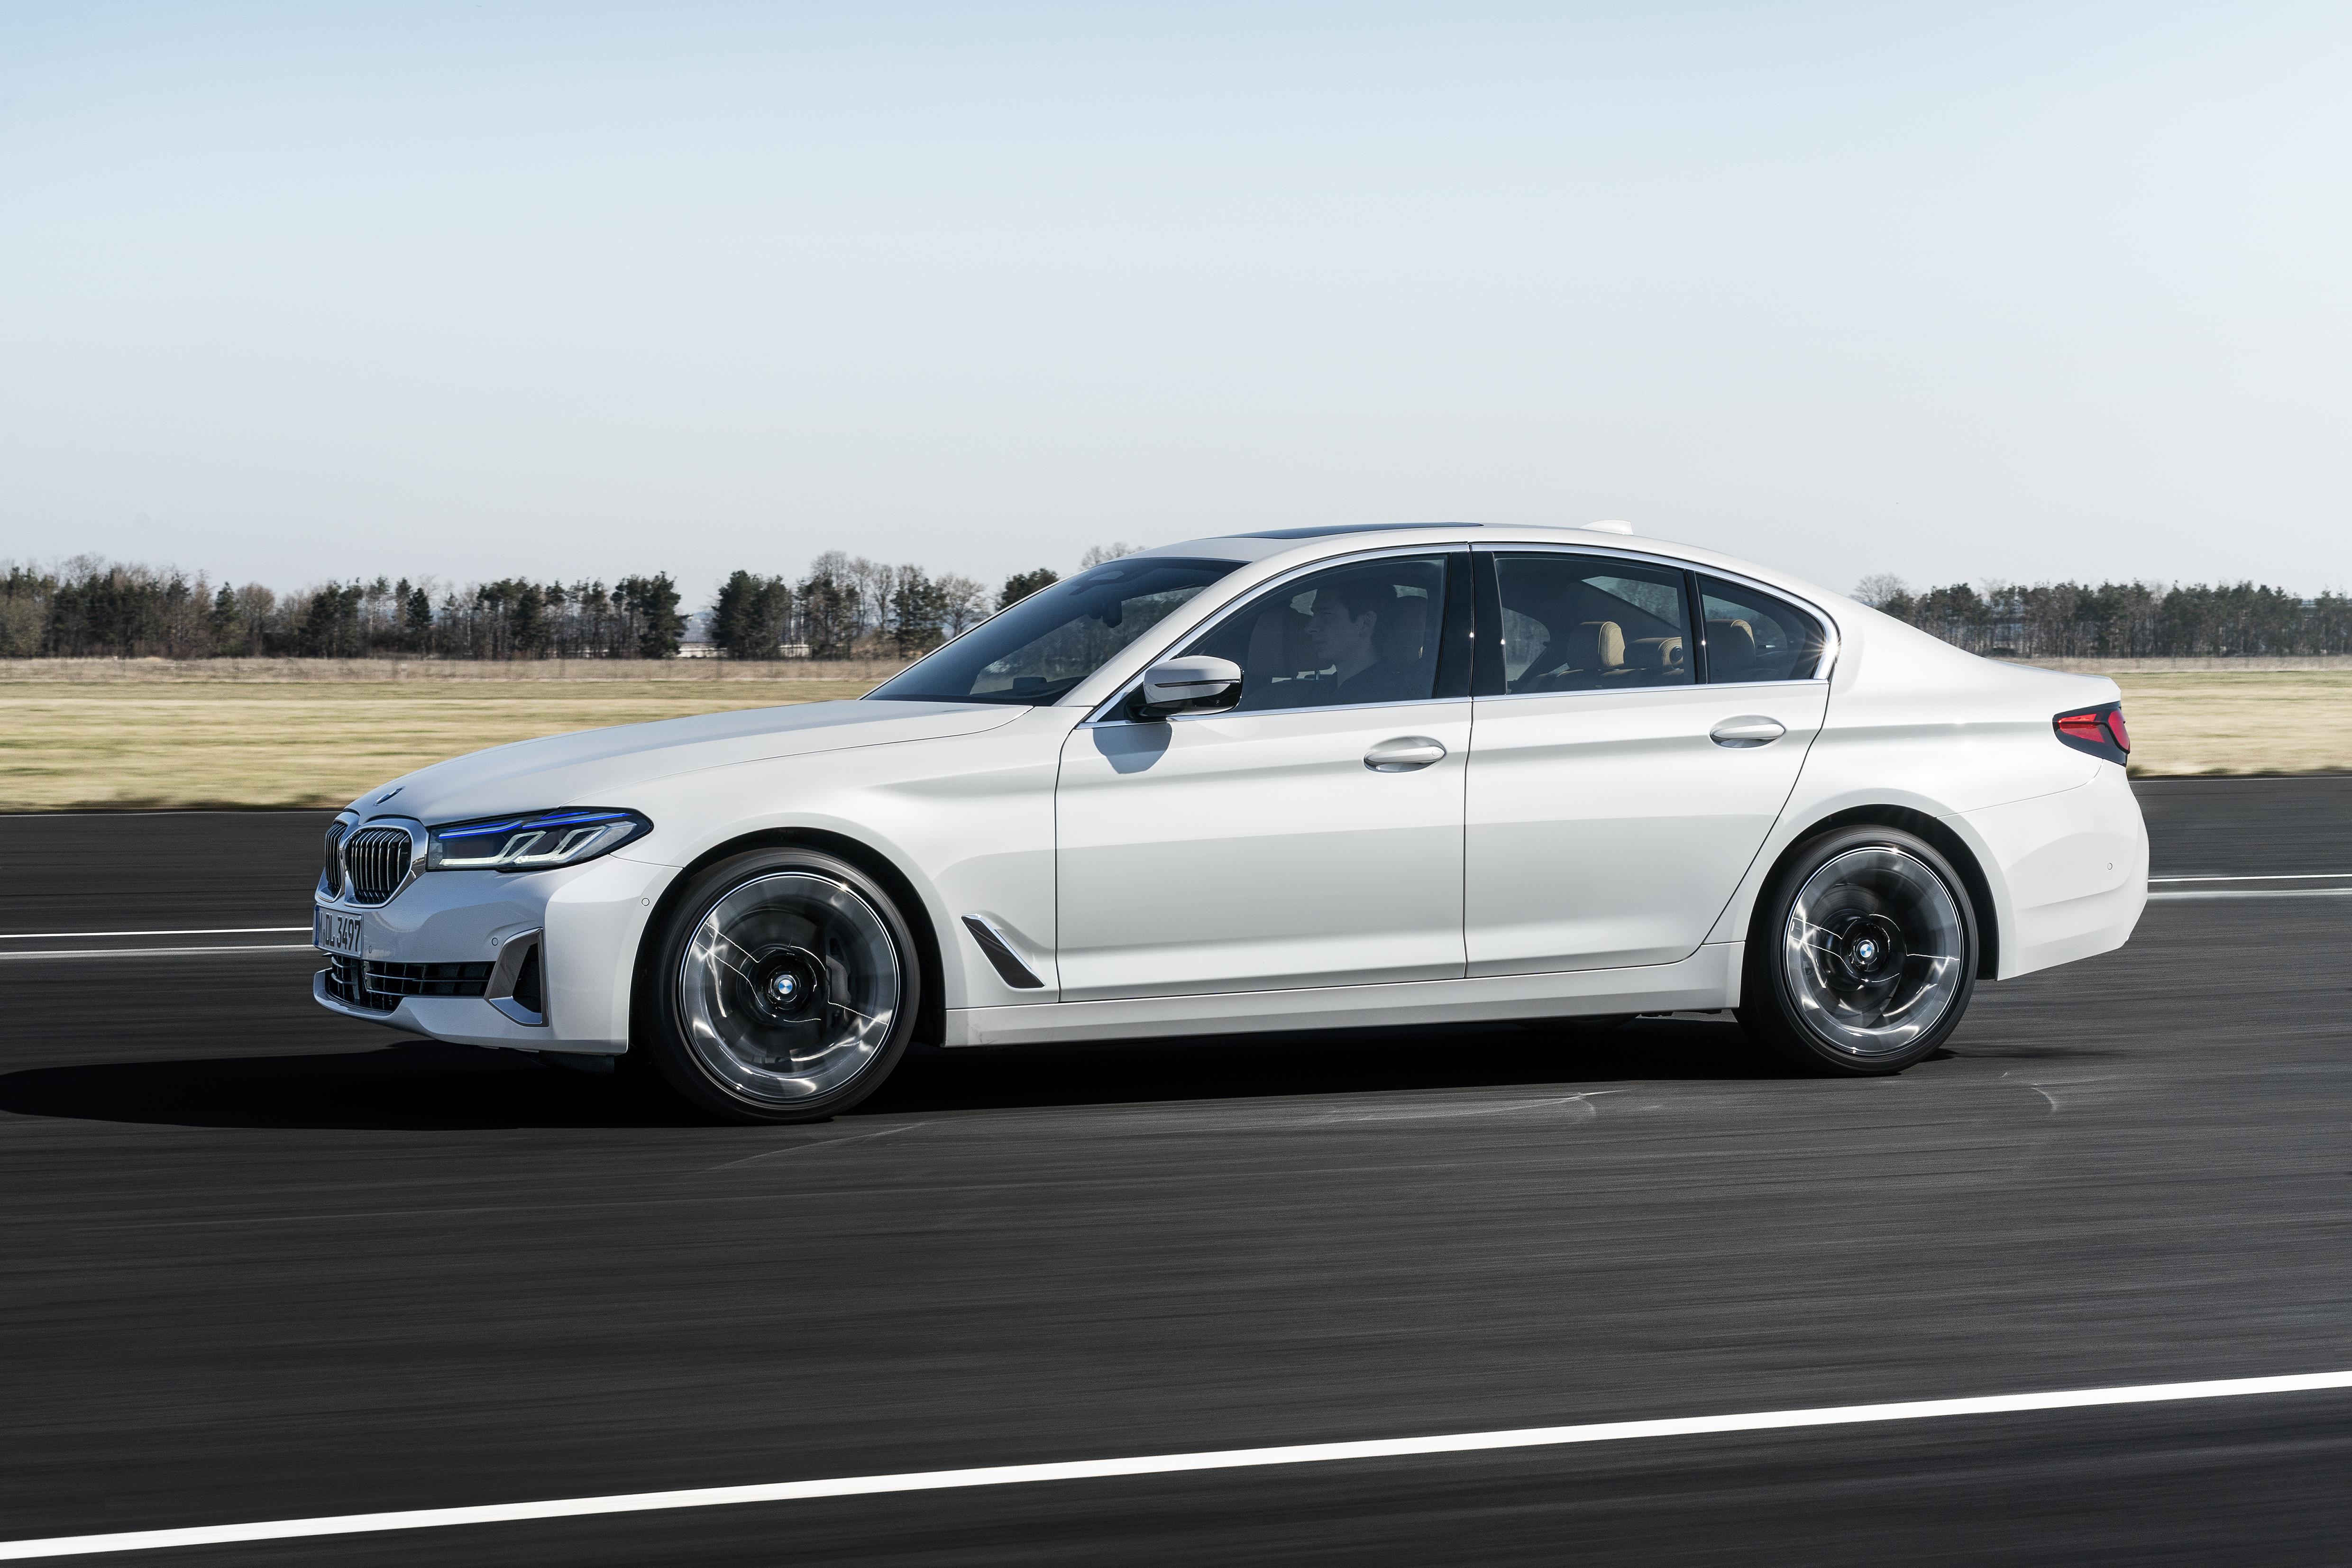 introducing the new updated 2021 bmw 5 series sedan g30 lci